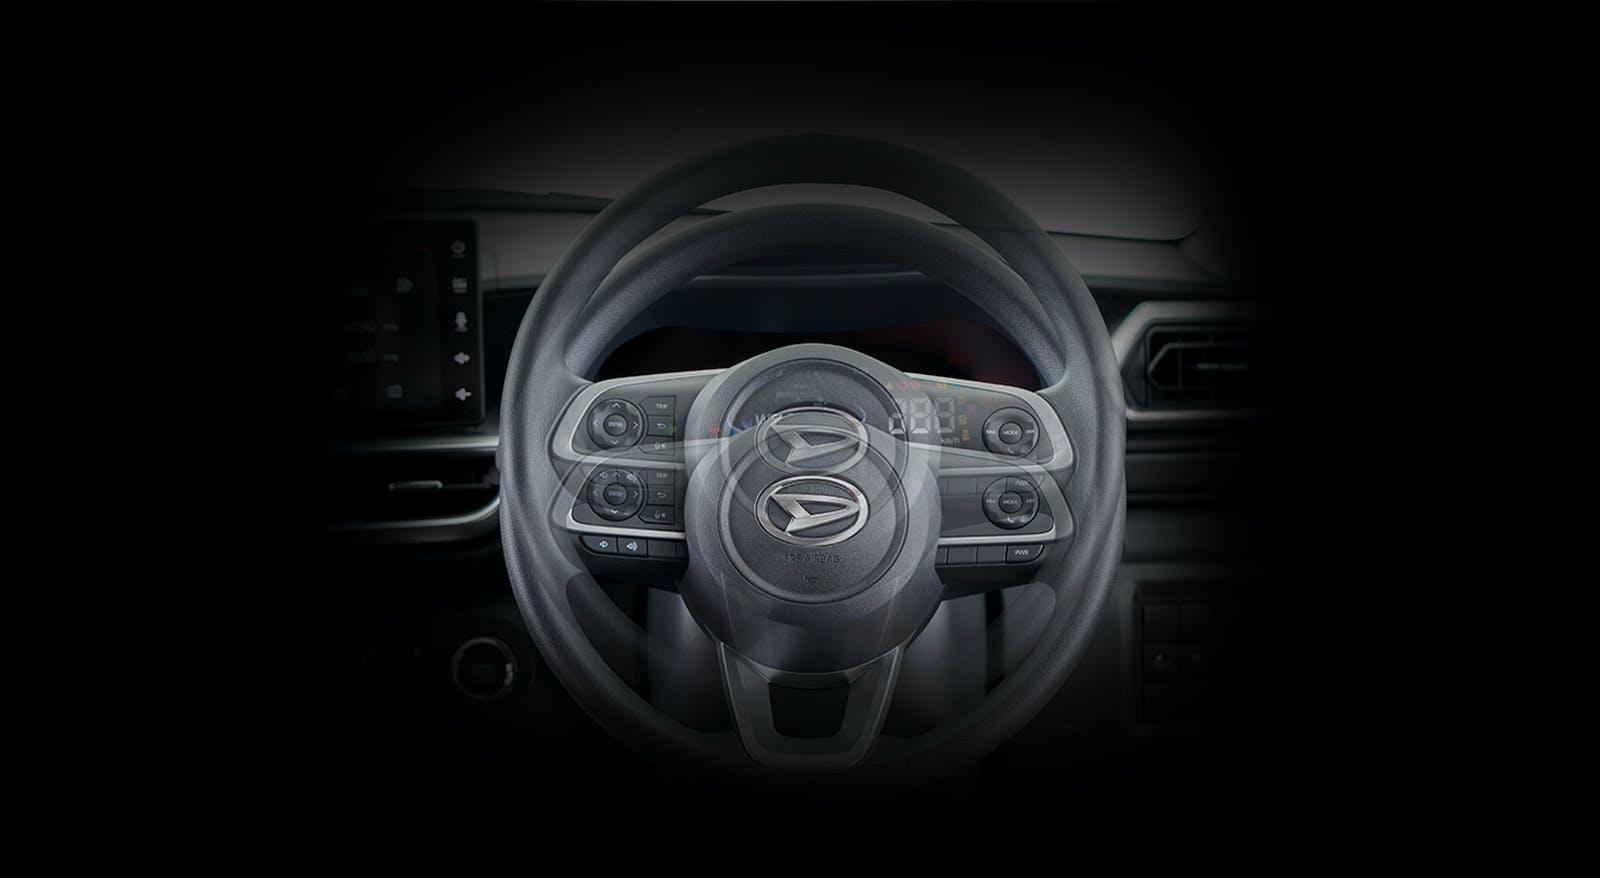 Harga dan Spesifikasi Daihatsu Rocky Pekanbaru - TILT STEERING